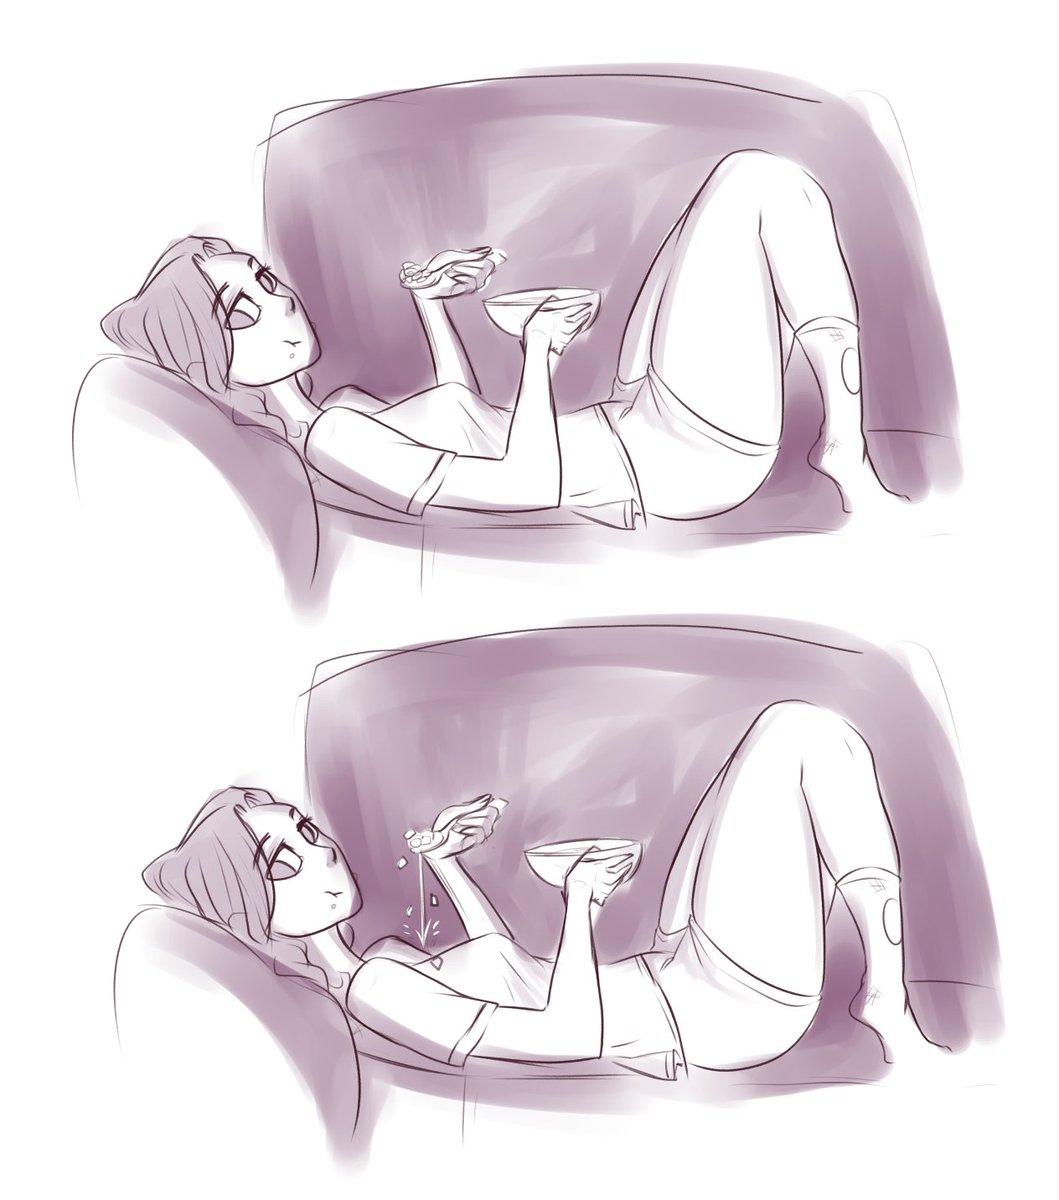 Sketches ://  #sketches #practice #girl #cerealday #damn #Watching